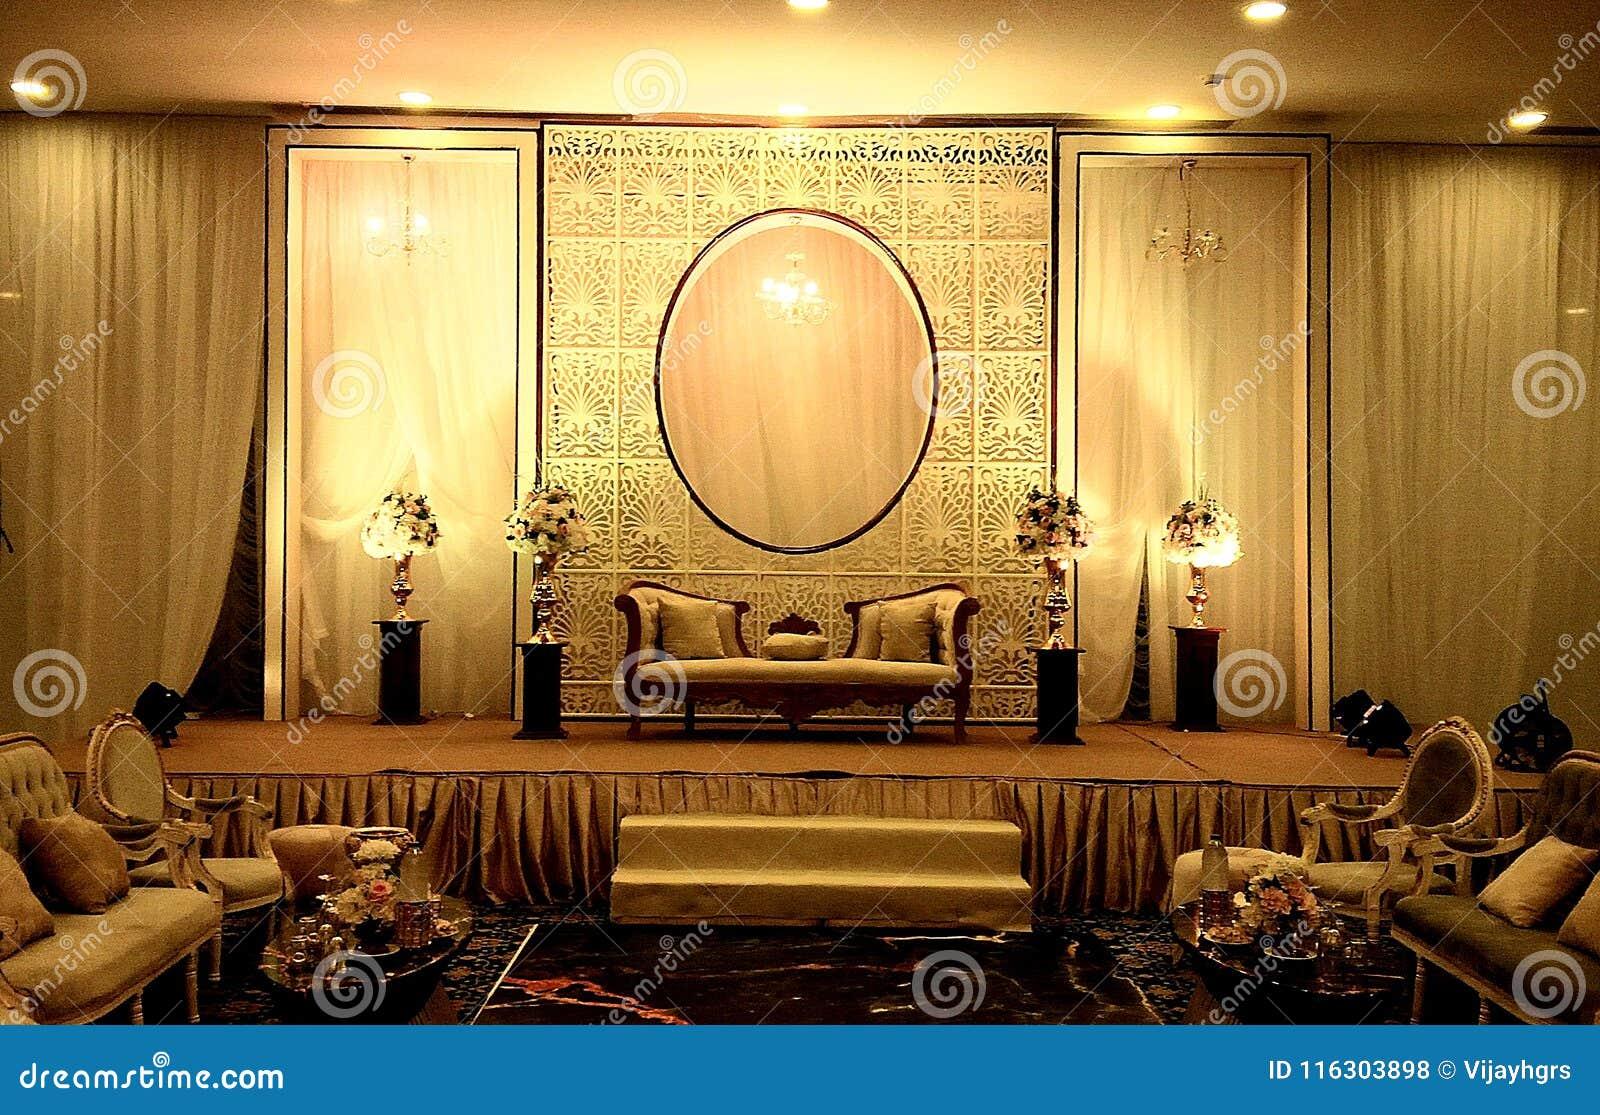 Elegant Banquet Hall Wedding Stage Decorations Stock Photo